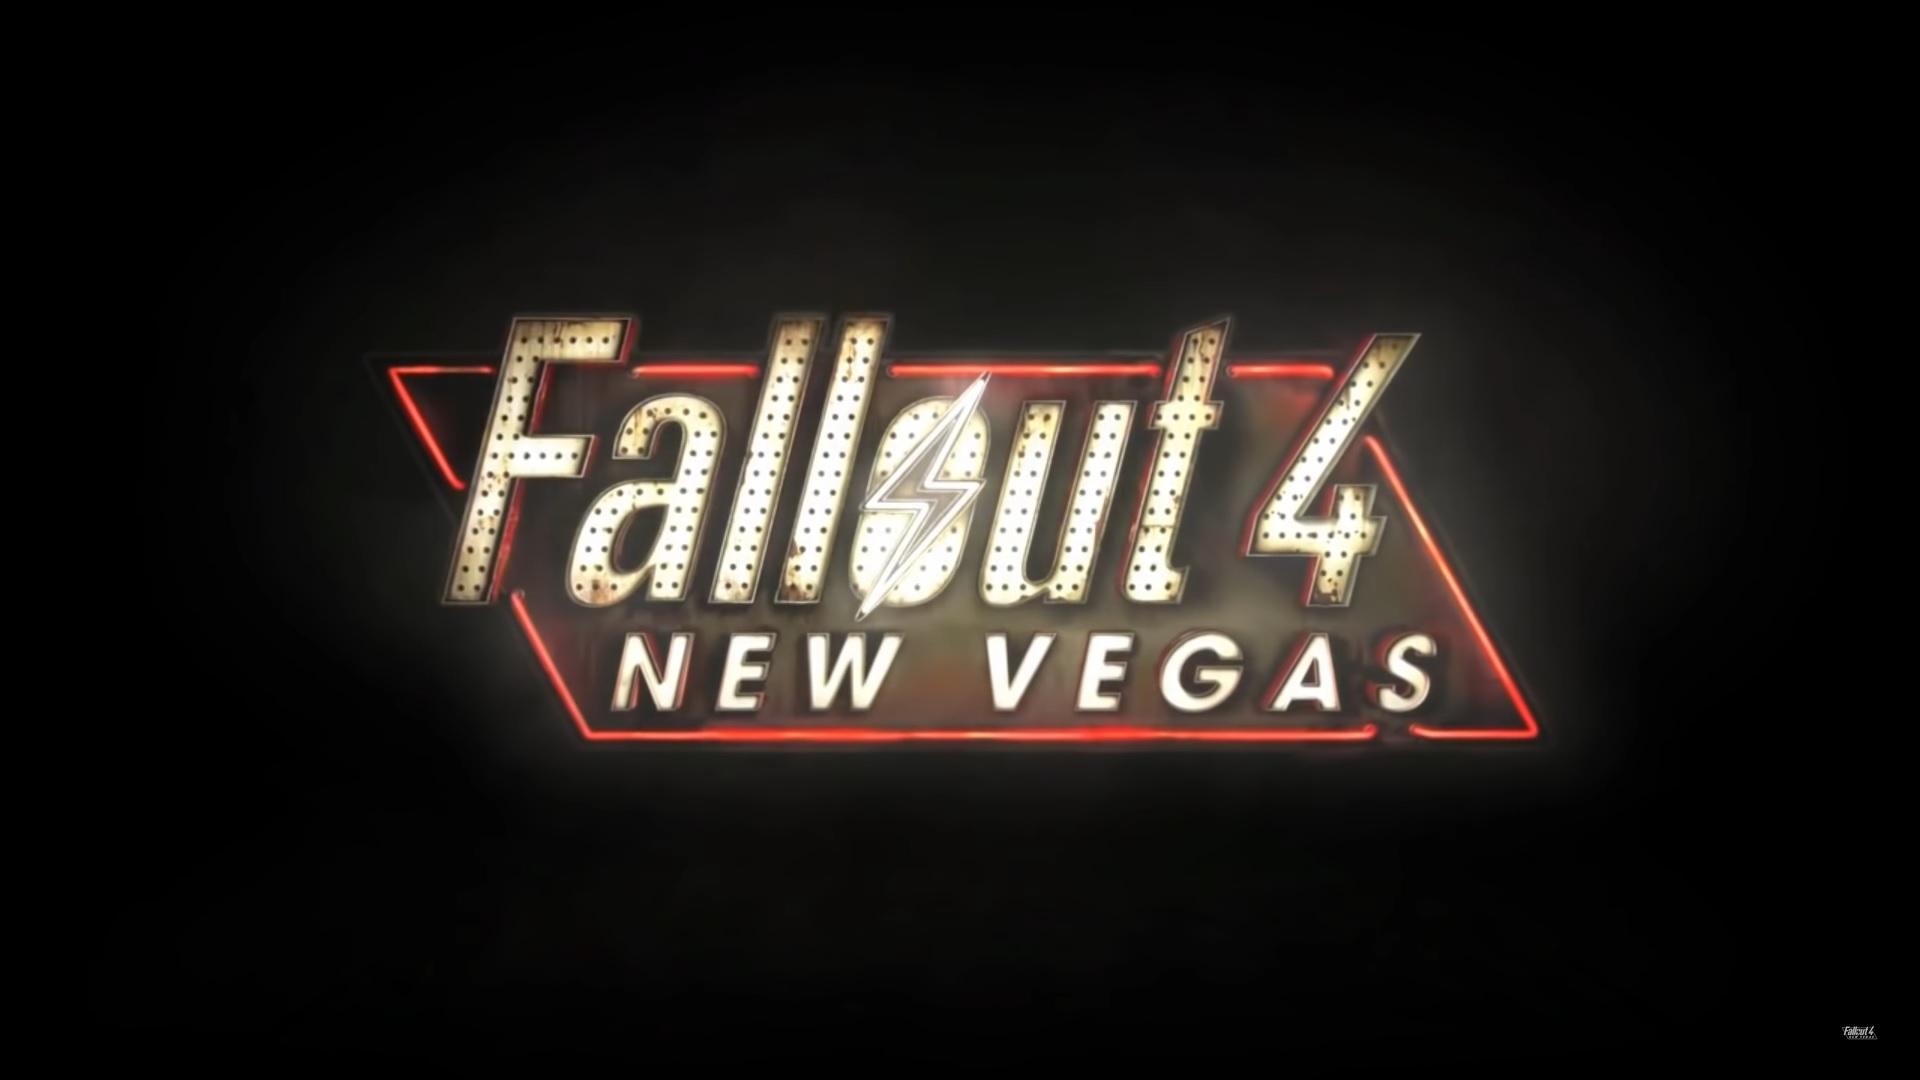 Fallout new vegas release date in Perth